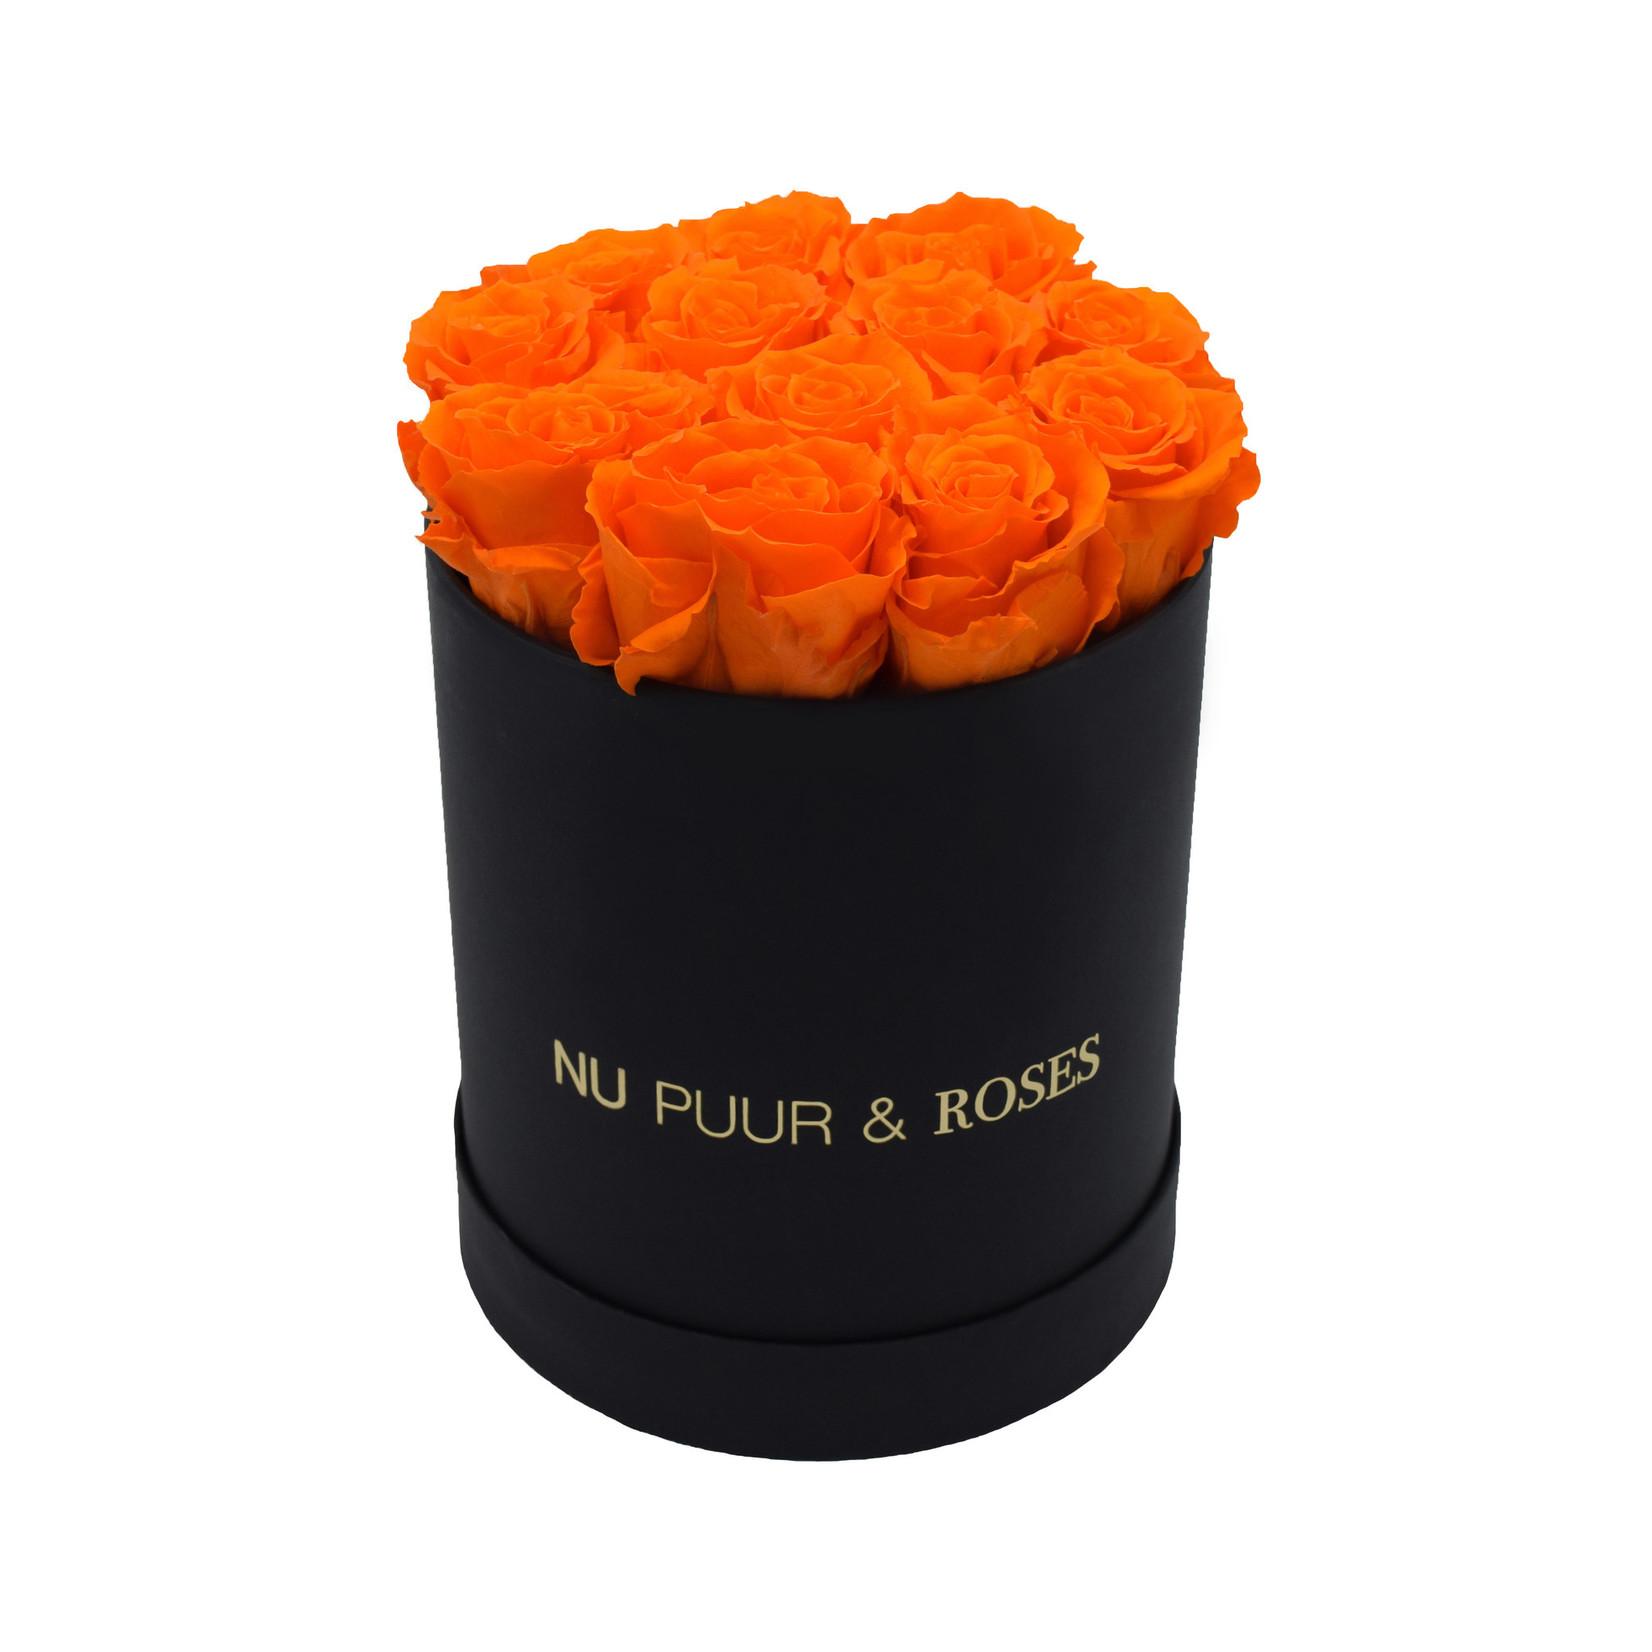 Small - Orange Endless Roses - Black Box